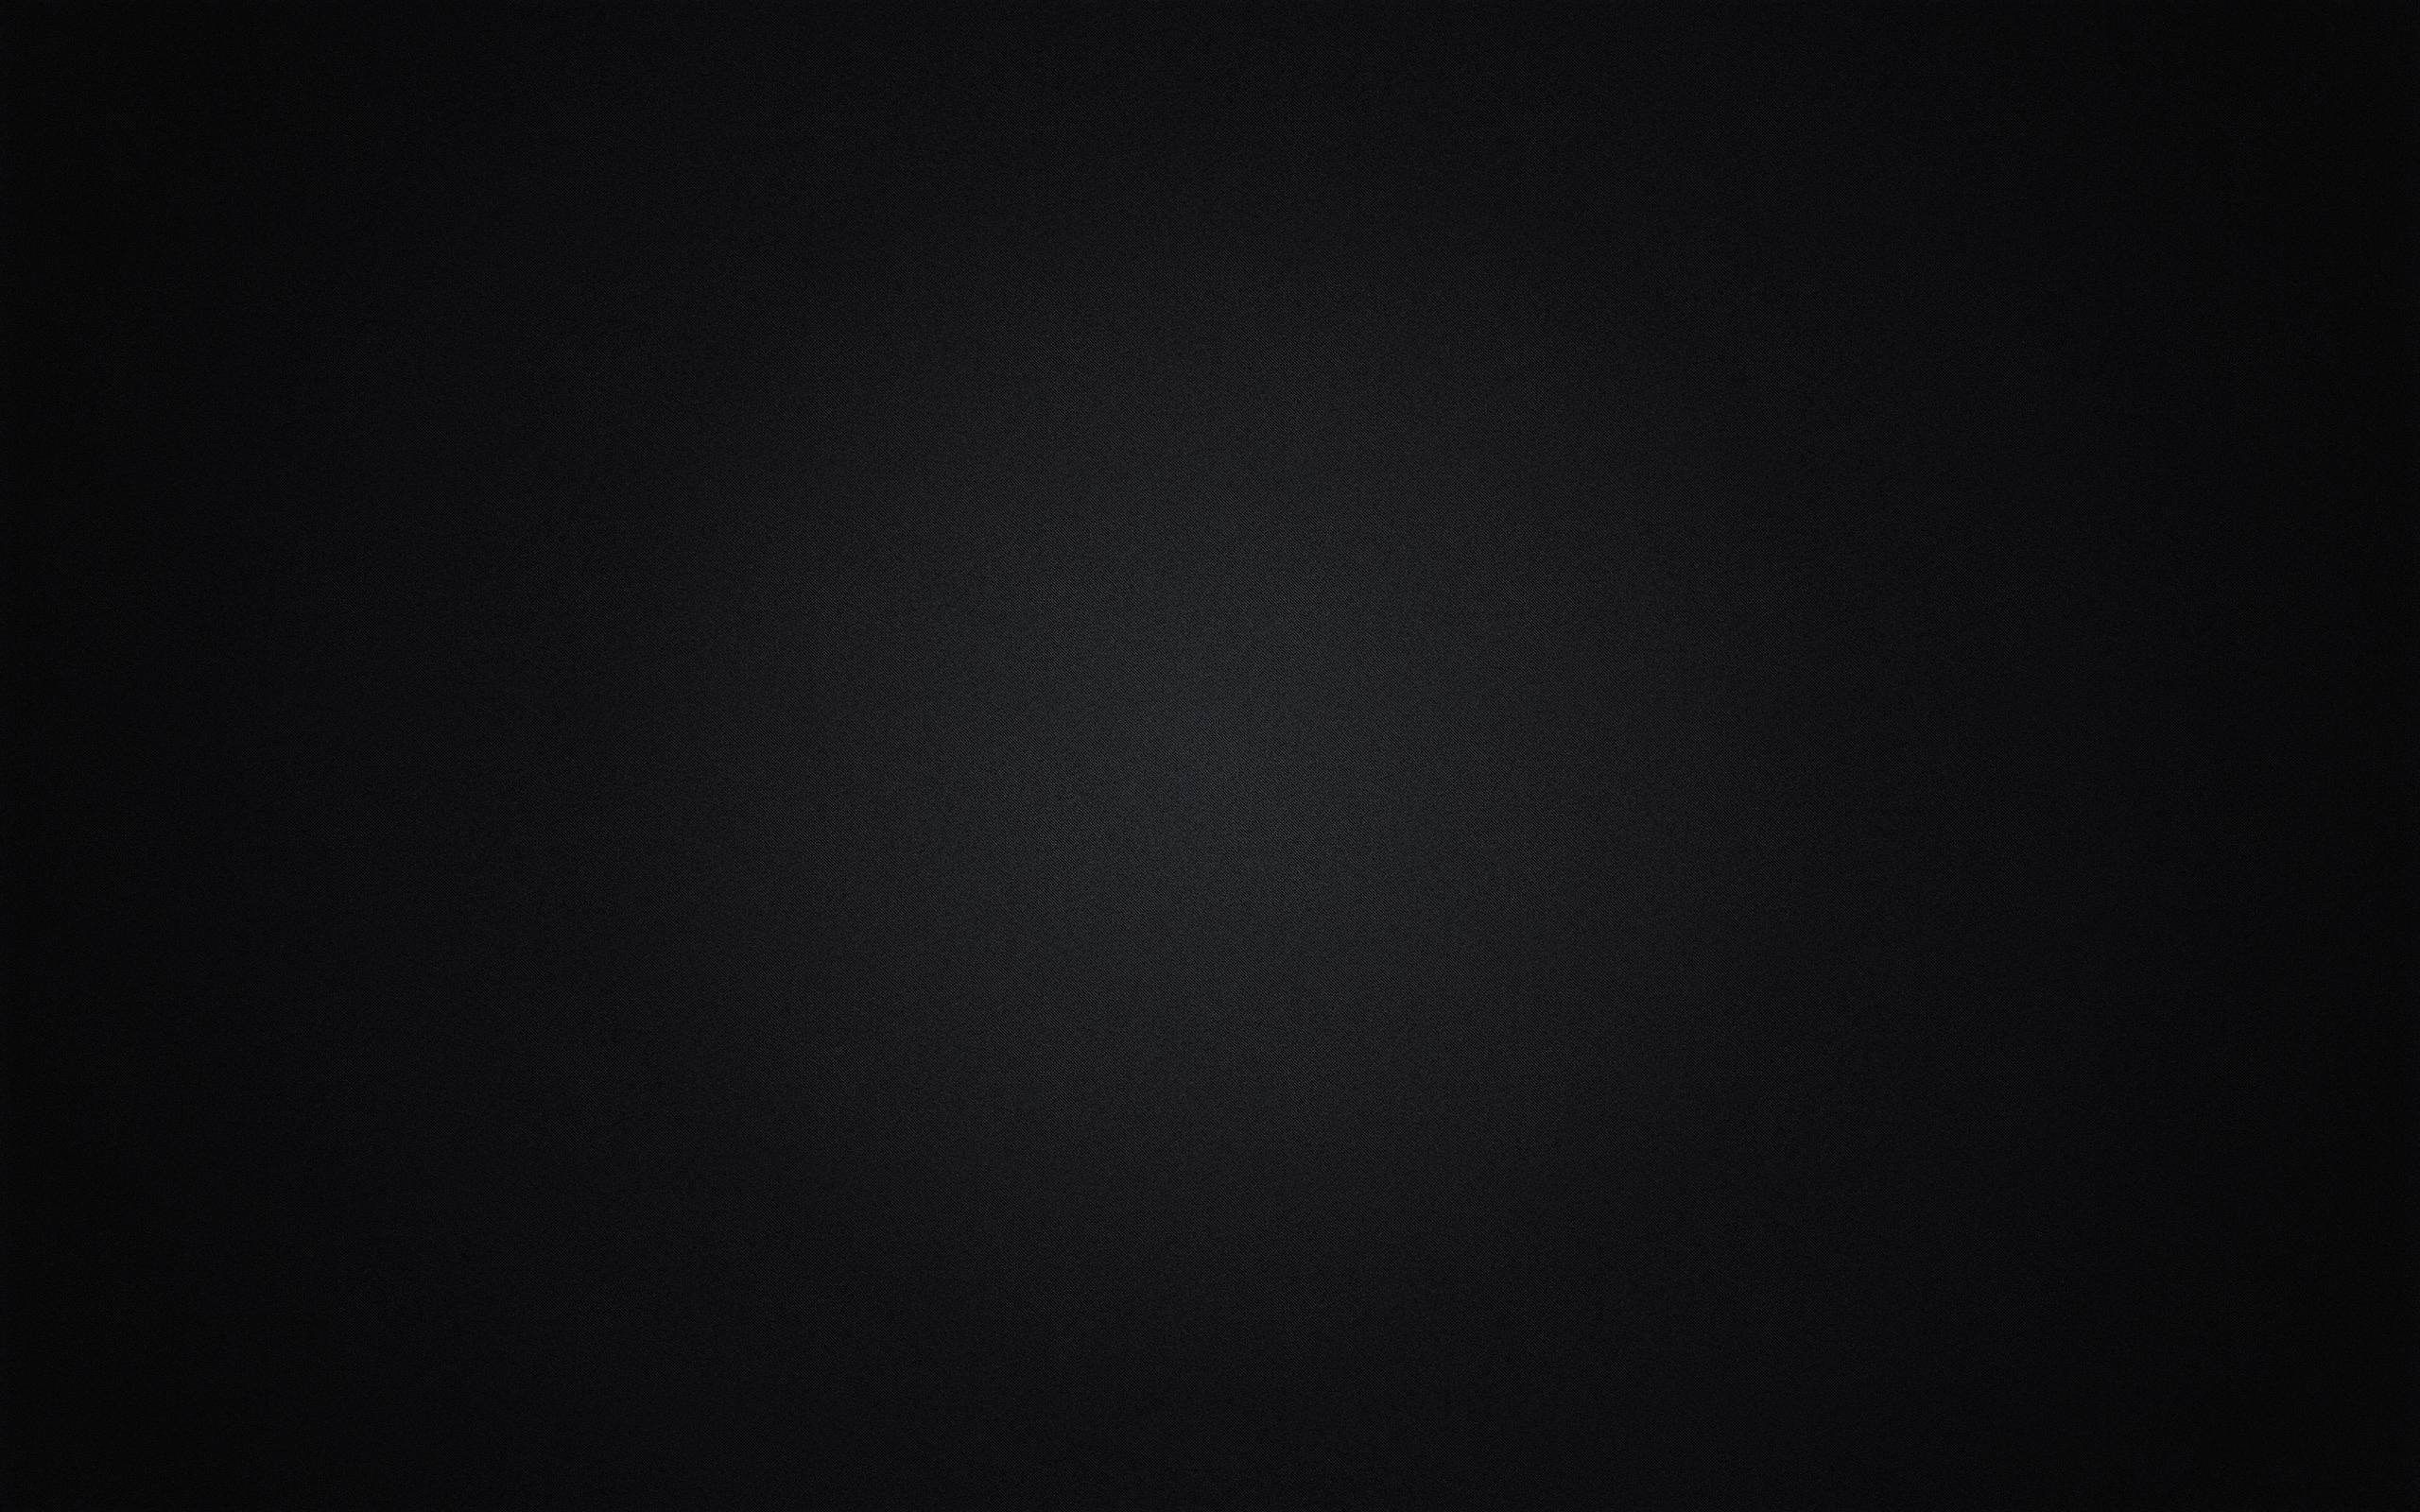 Black Background 8820   HDWPro 2560x1600